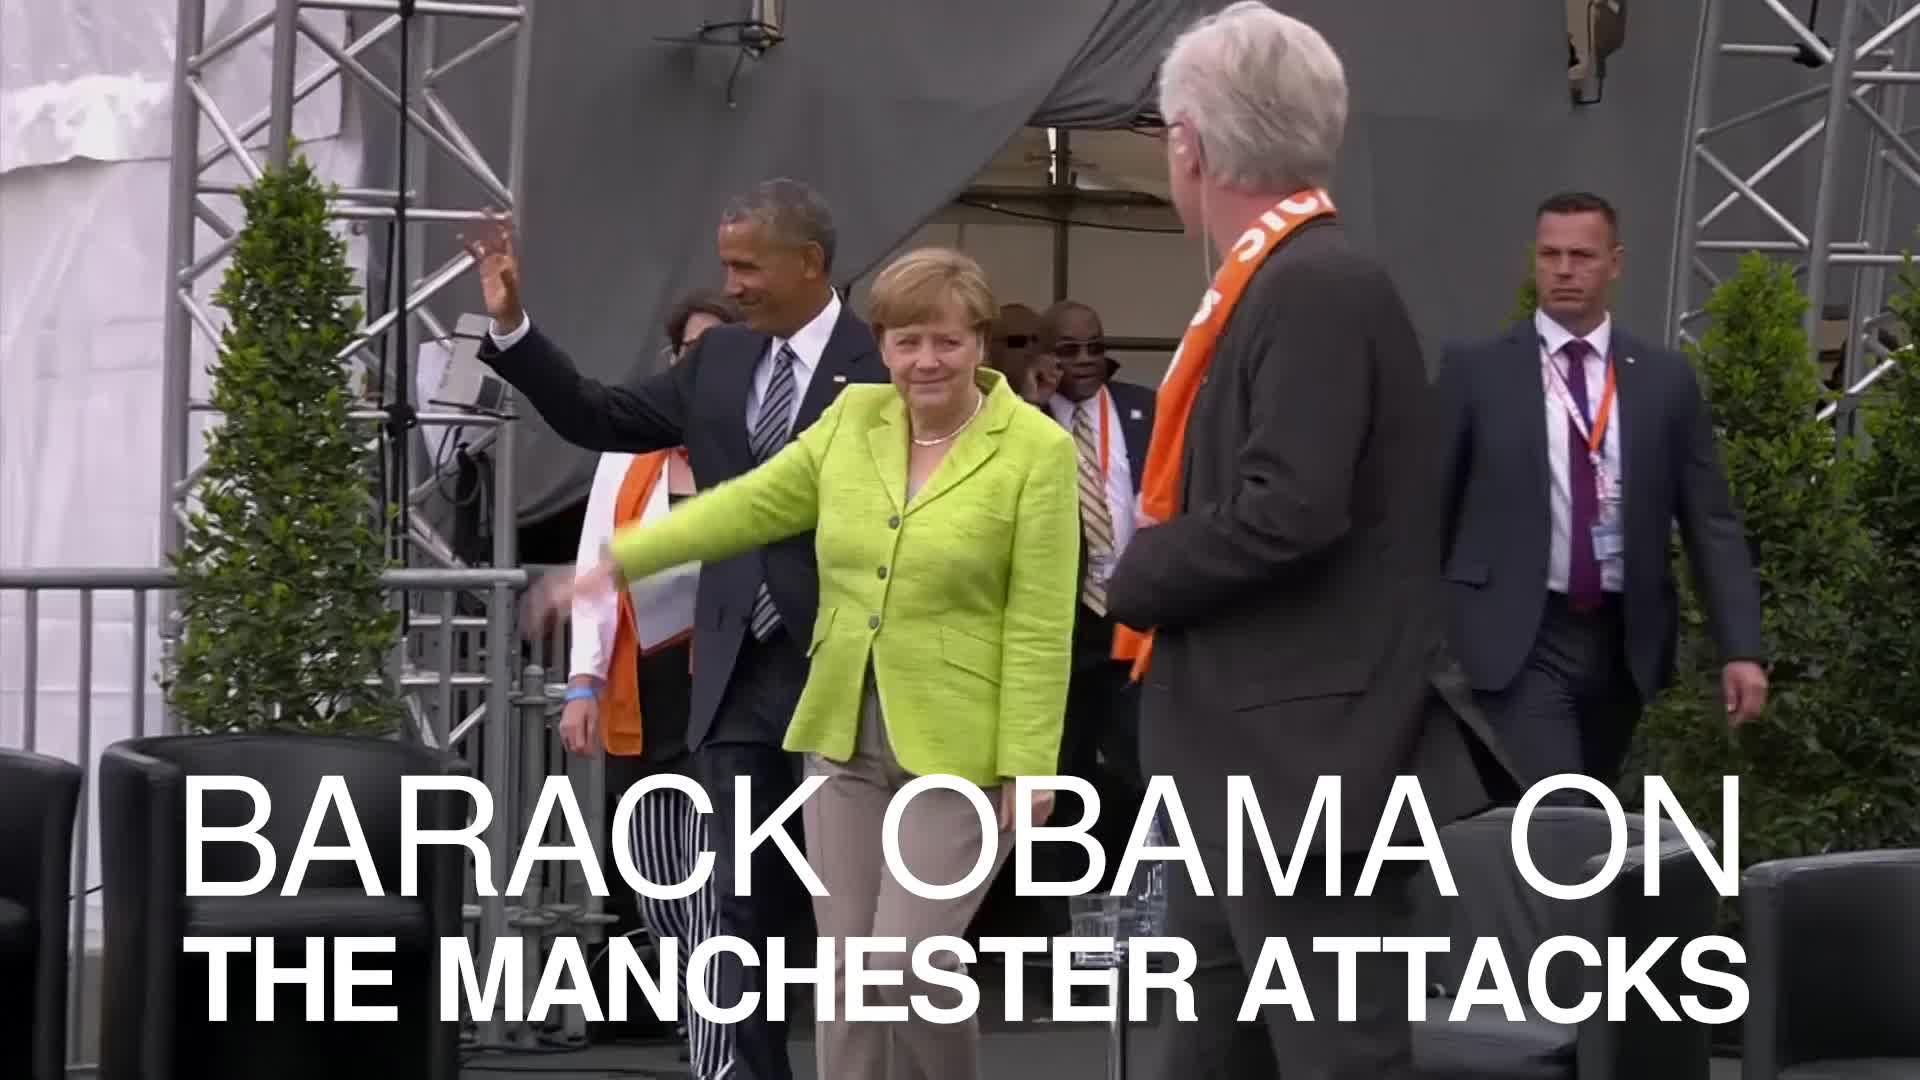 Barack Obama 'heartbroken' about Manchester attack